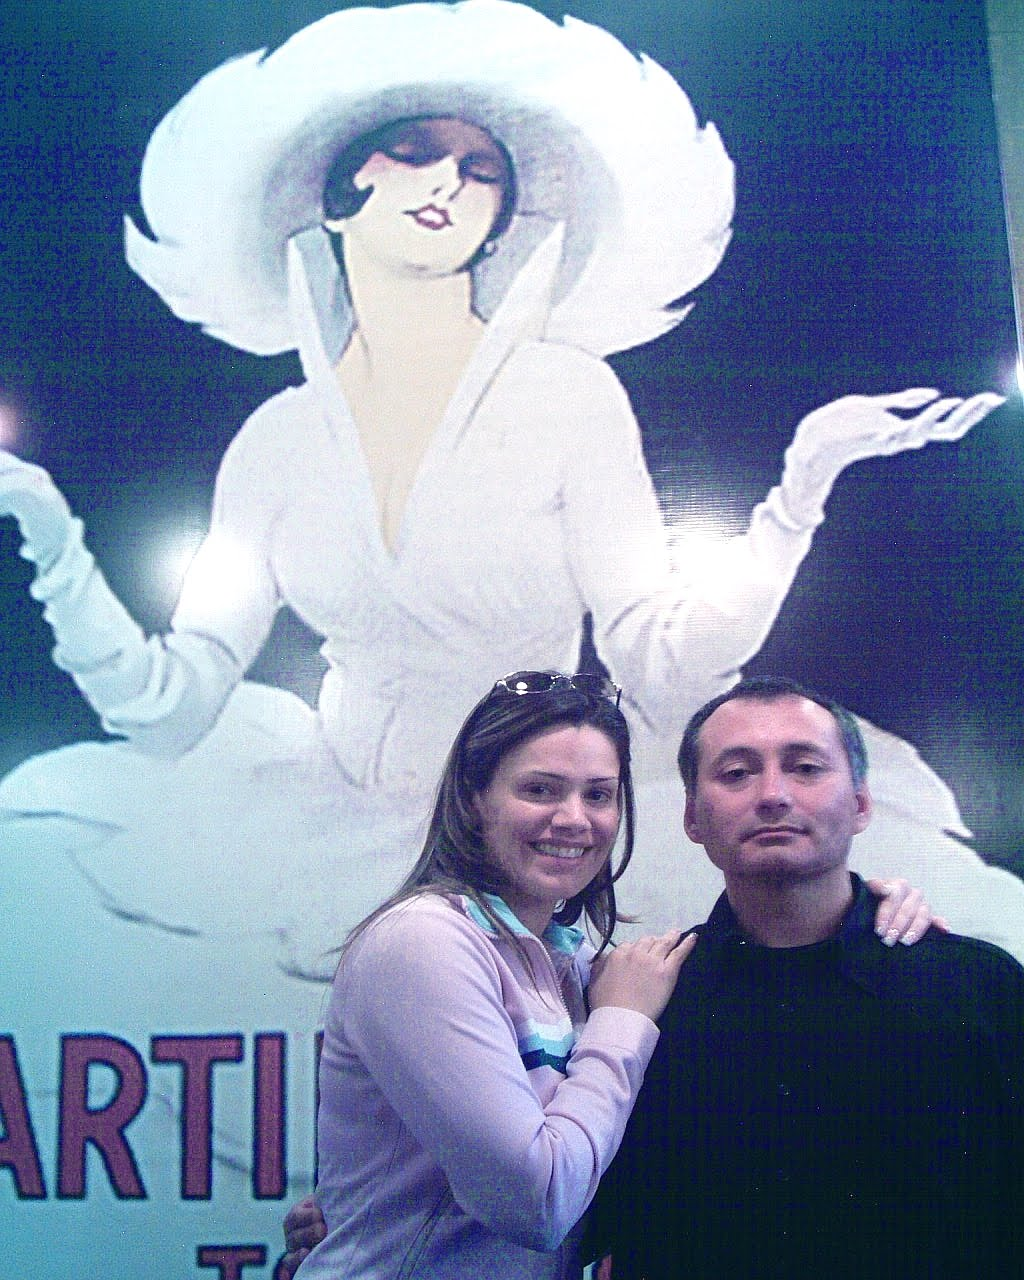 http://2.bp.blogspot.com/_MTMW0wRxmLE/TNSZWA77_pI/AAAAAAAAA5Q/lEKsIwr_FMw/s1600/Adolfo+Vasquez+Rocca+y+Luz+Elena_Televisa+M%C3%A9xico+.JPG